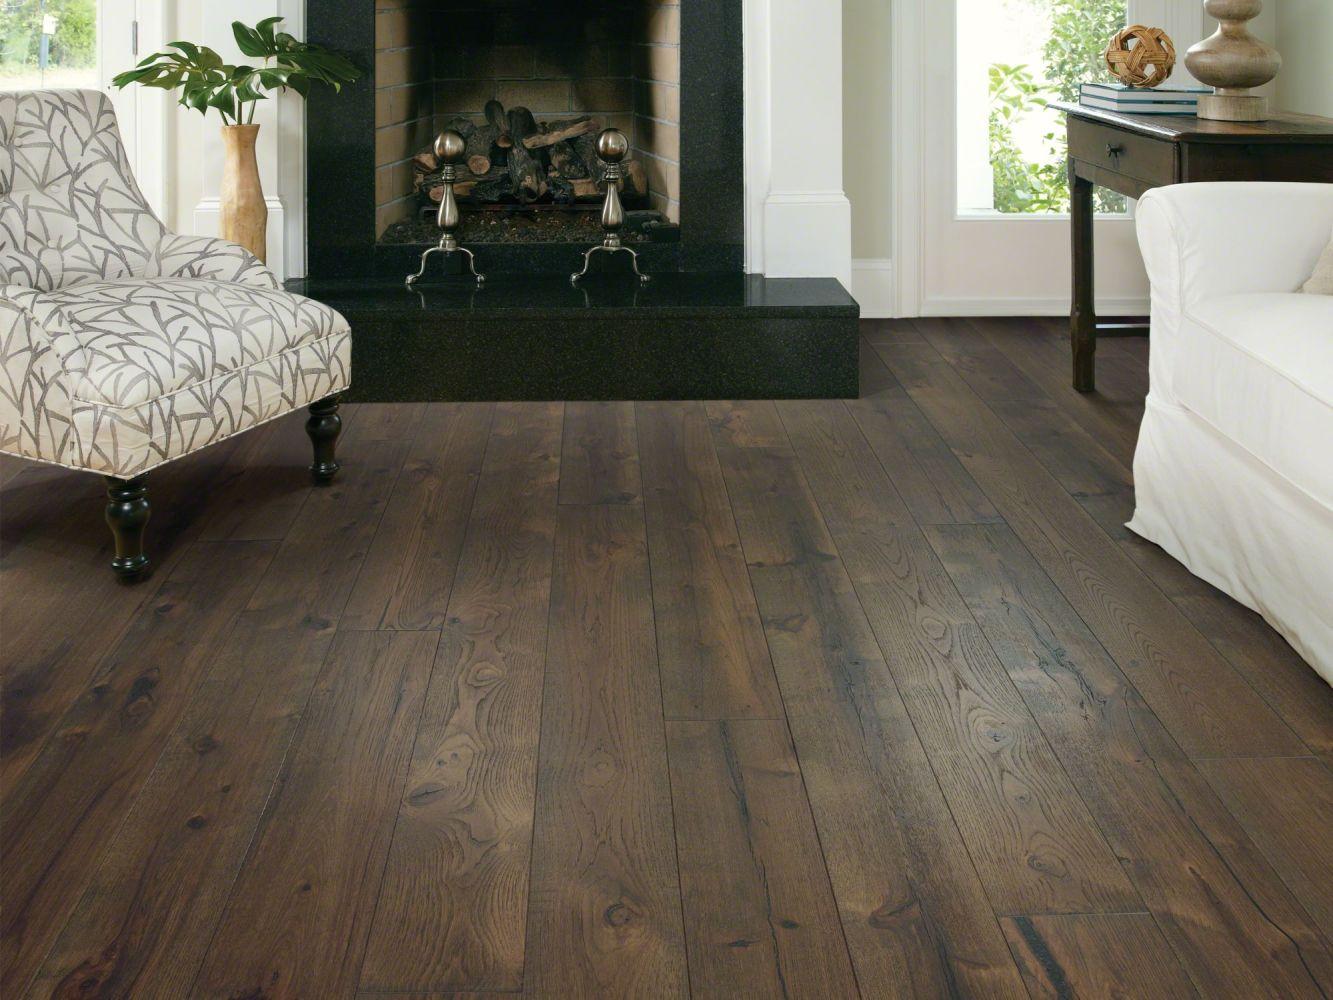 Shaw Floors Duras Hardwood Impressions Hickory Majestic 09023_HW673